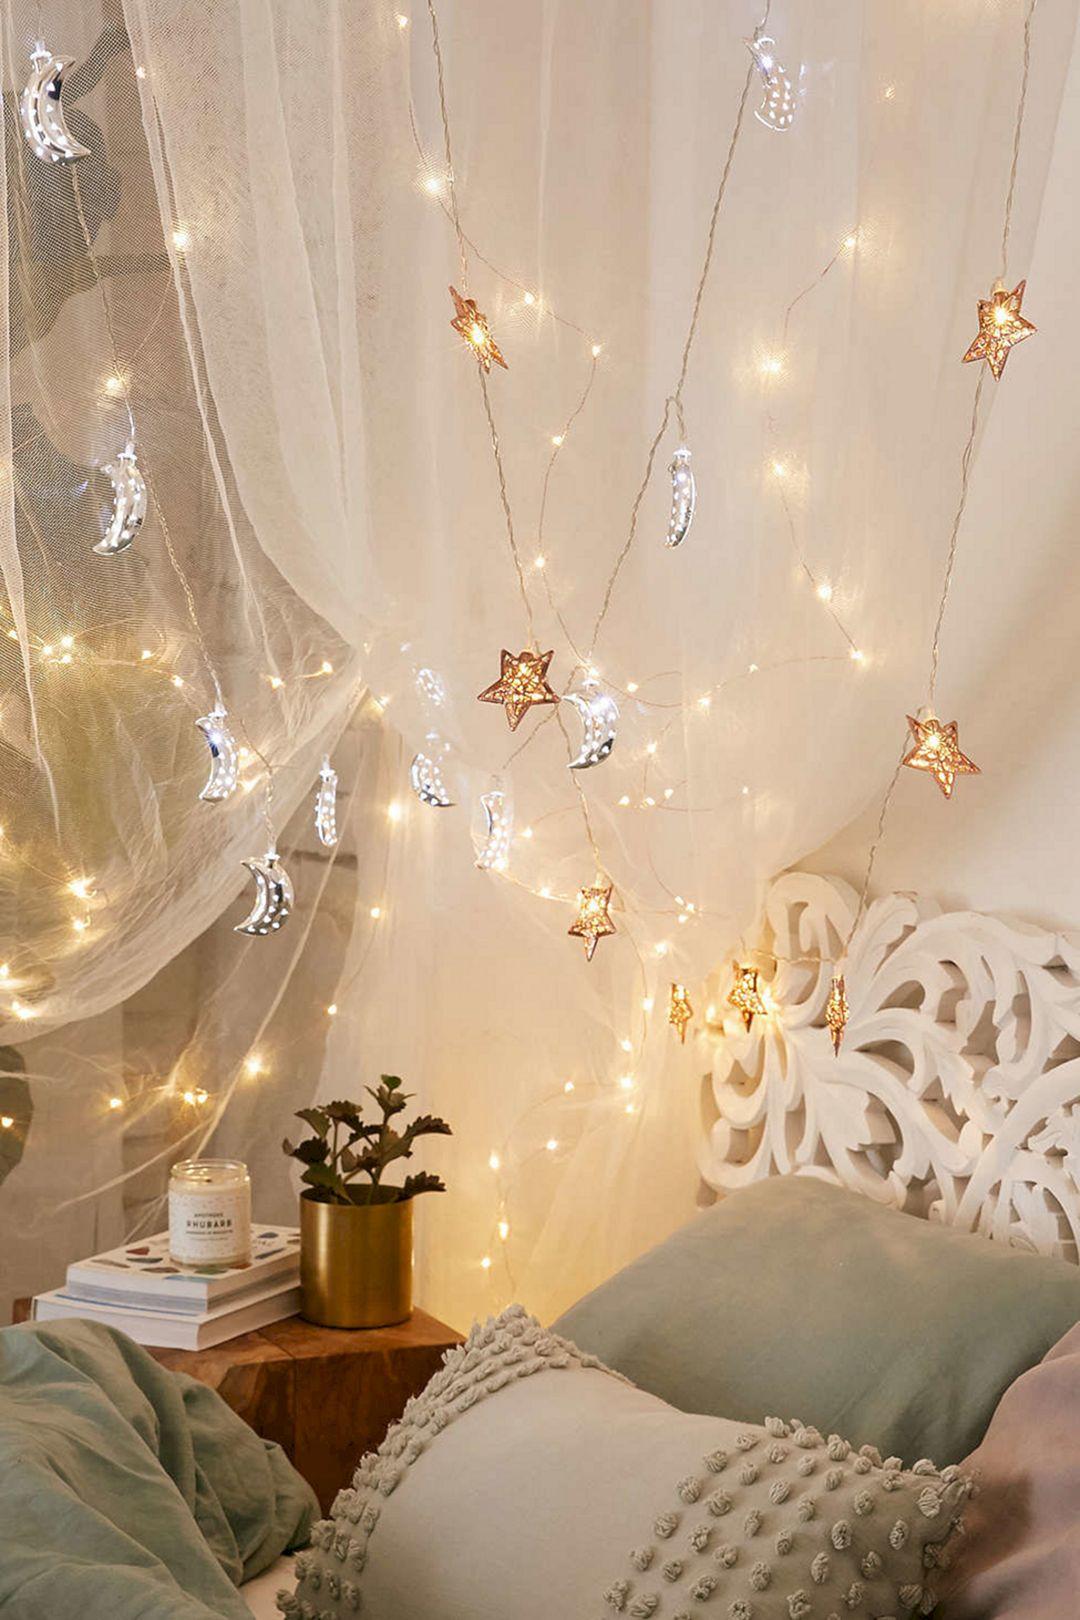 Incredible Yellow Aesthetic Bedroom Decorating Ideas 26 Decoredo